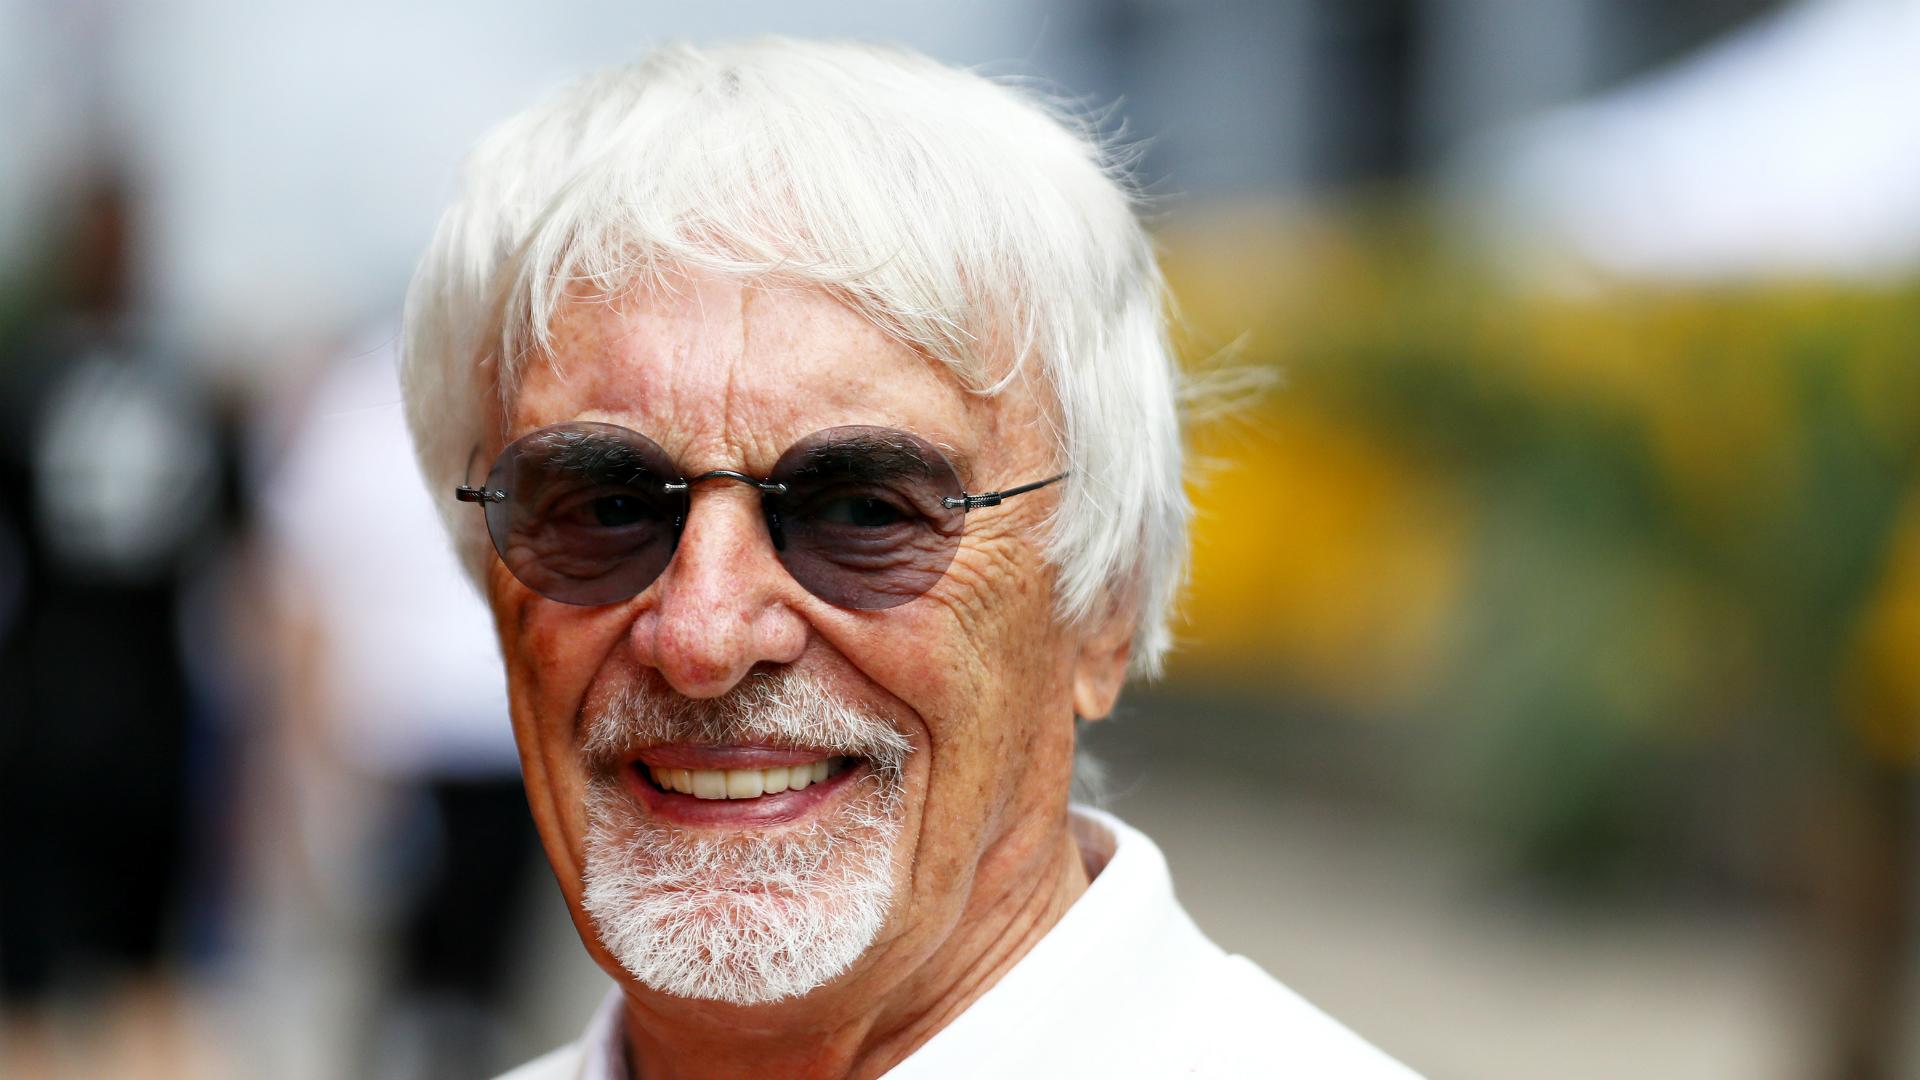 Coronavirus: Bernie Ecclestone says F1 season should be called off